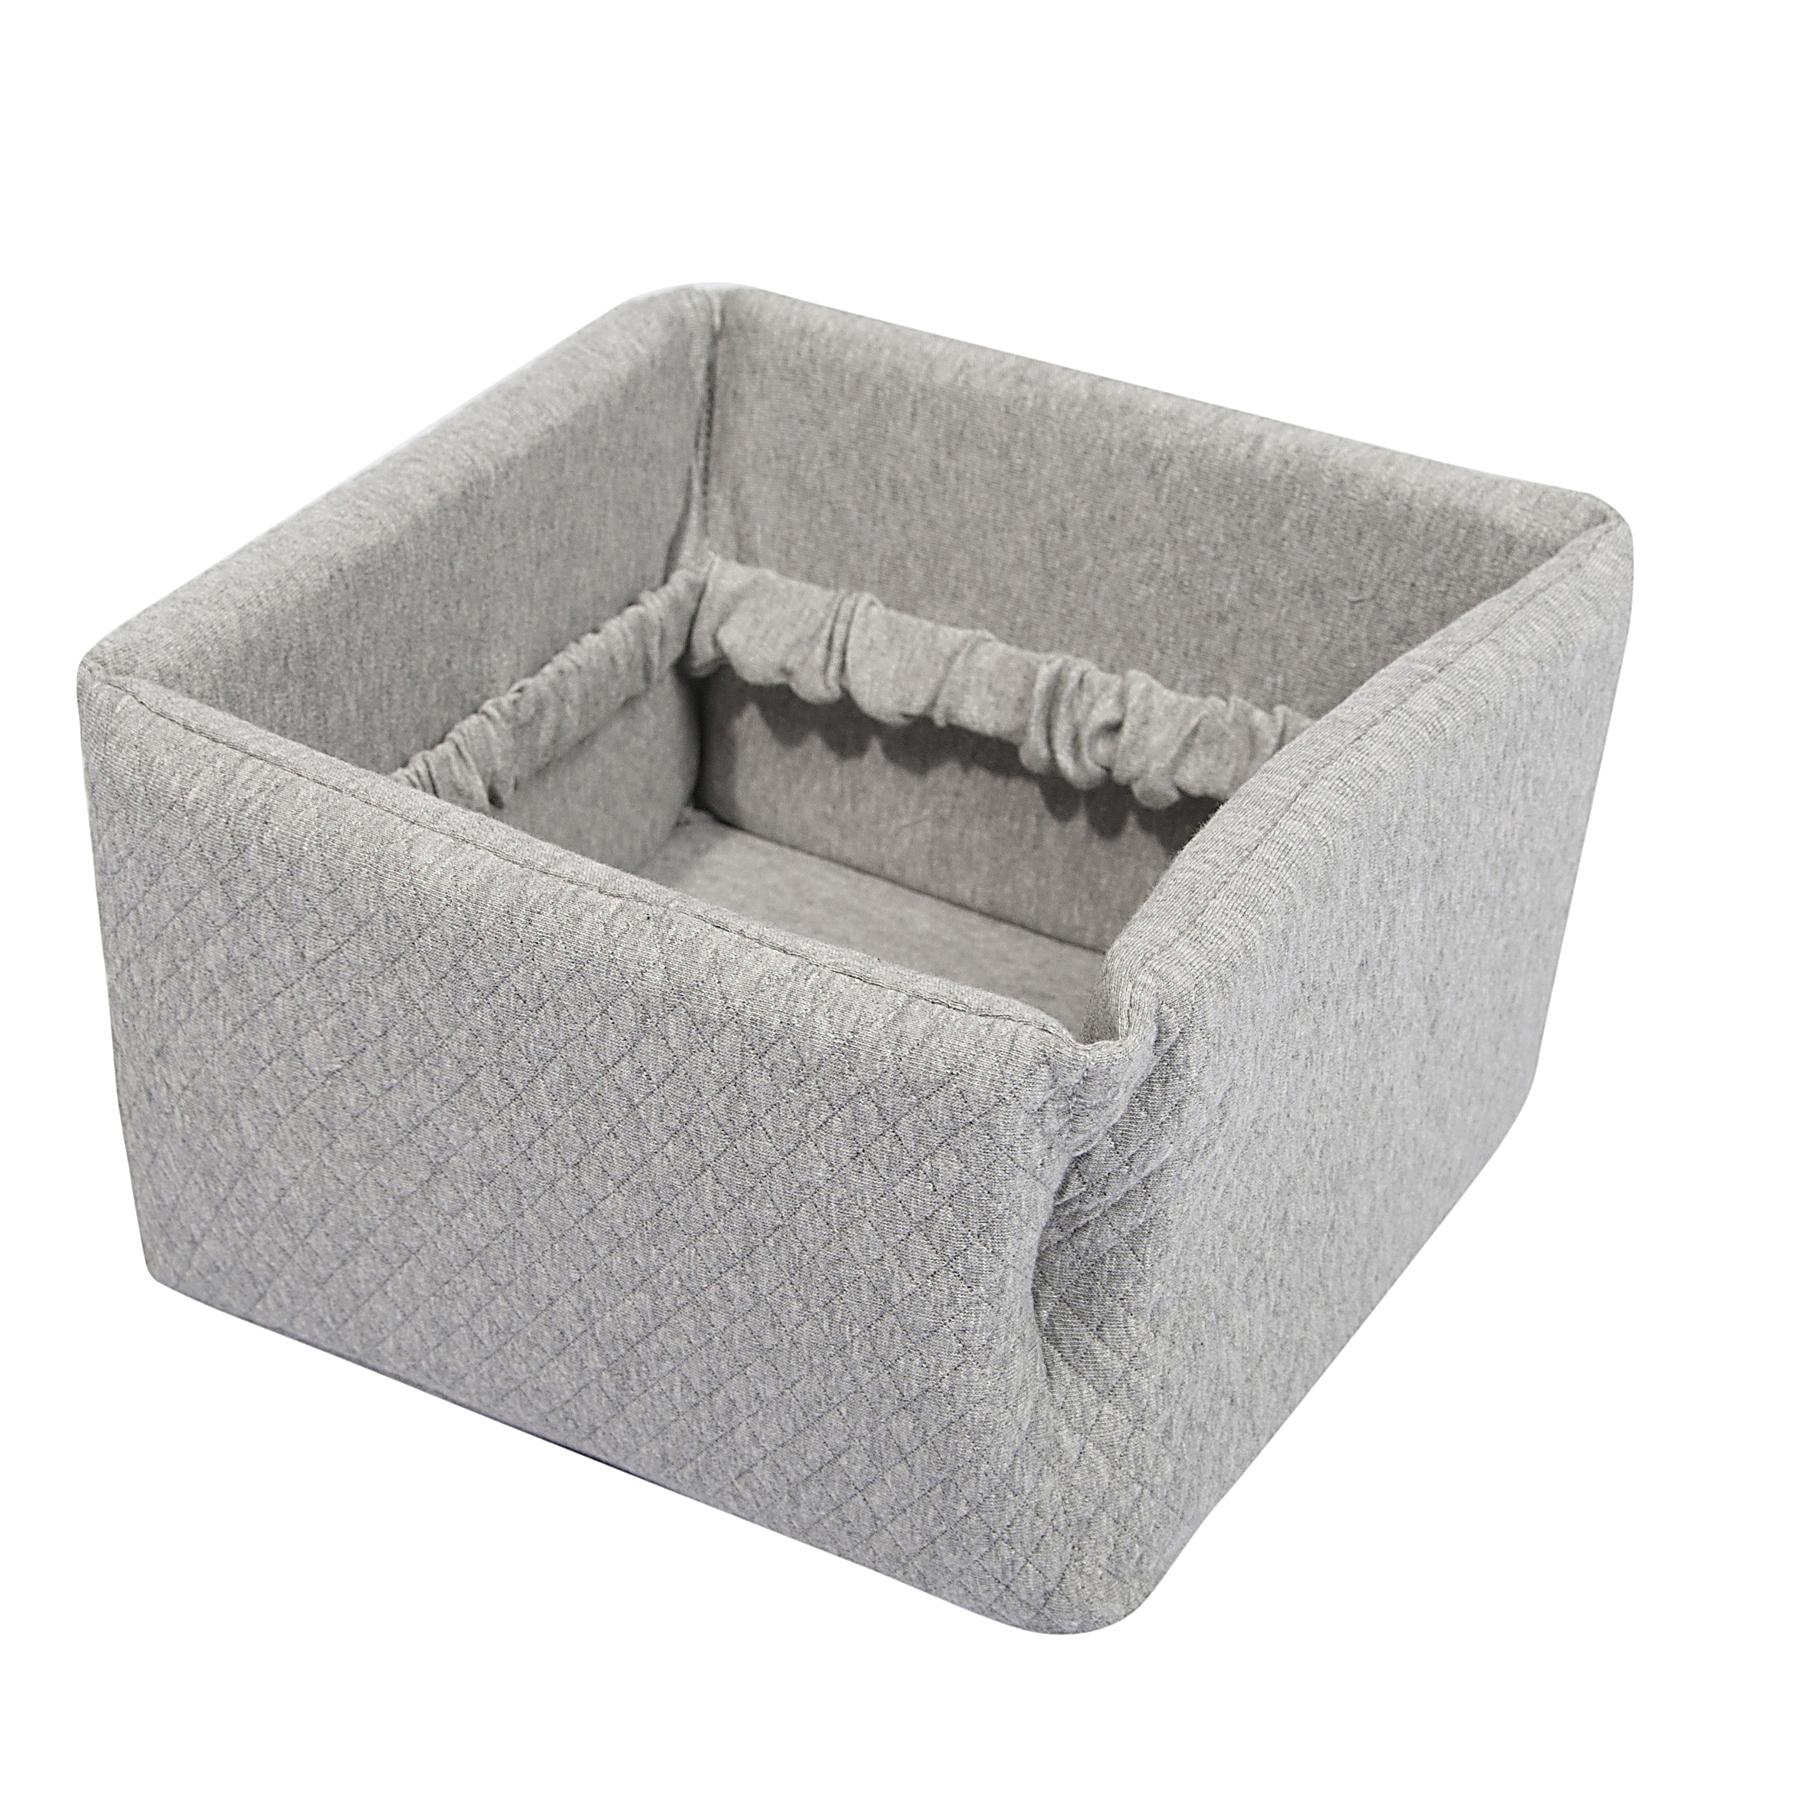 Afbeelding Trixie Nursery Basket I Diamond Stone